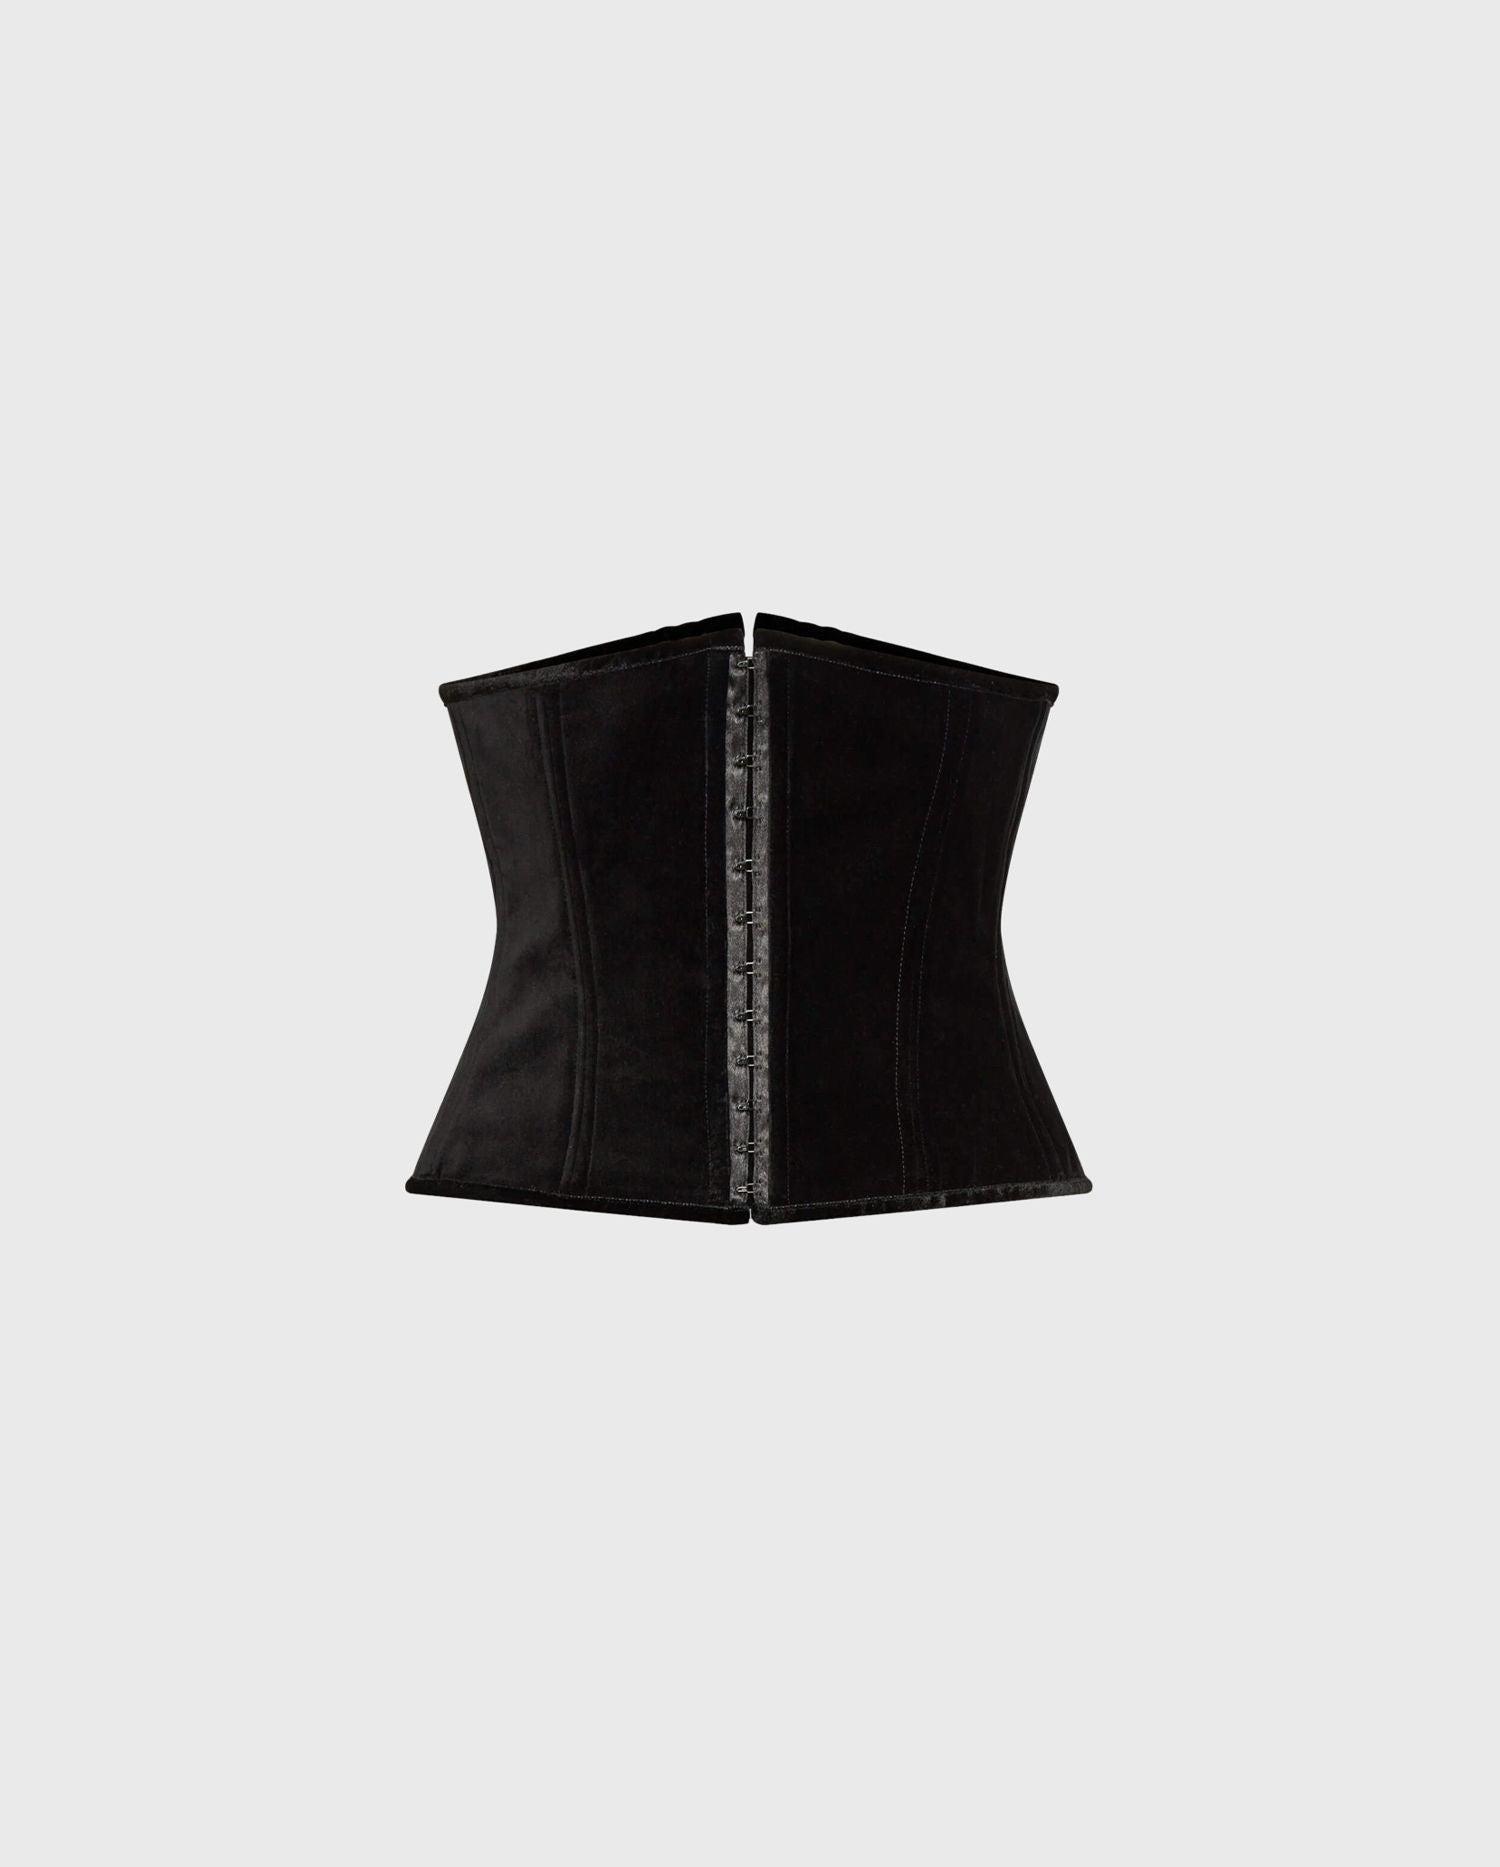 ELVIA : Wide Velvet Corset In Black | ANNE FONTAINE